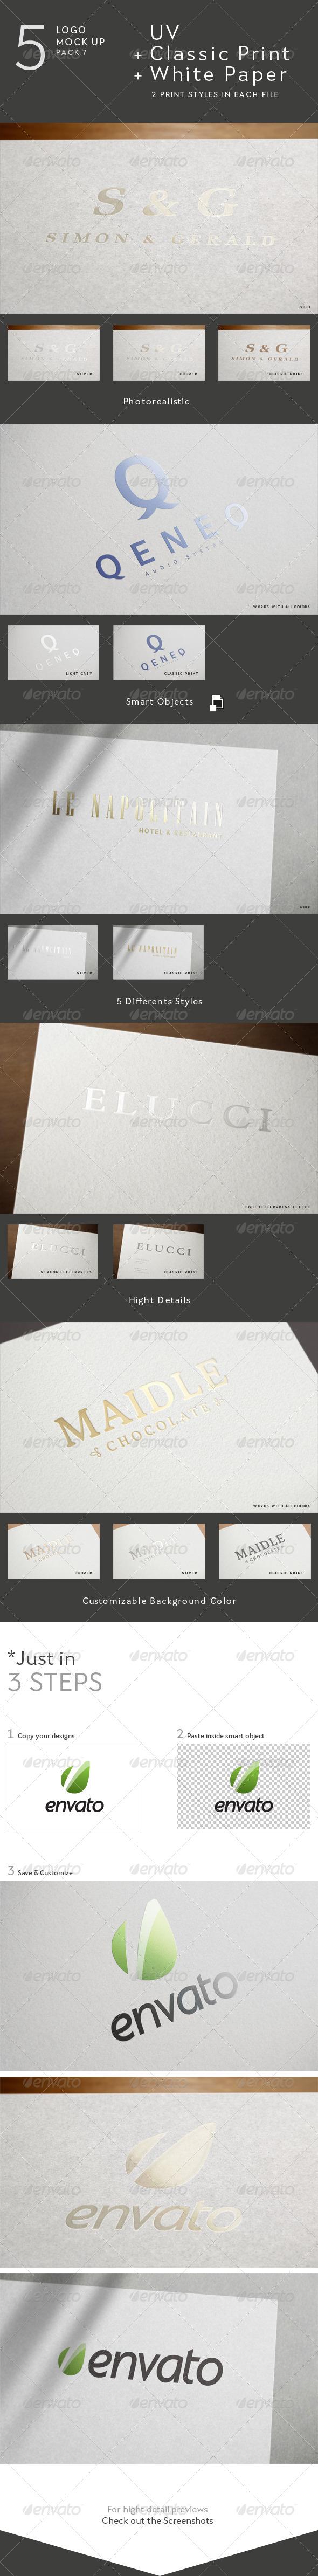 GraphicRiver 5 Logo Mock Up 7- UV & Classic Print 4328901